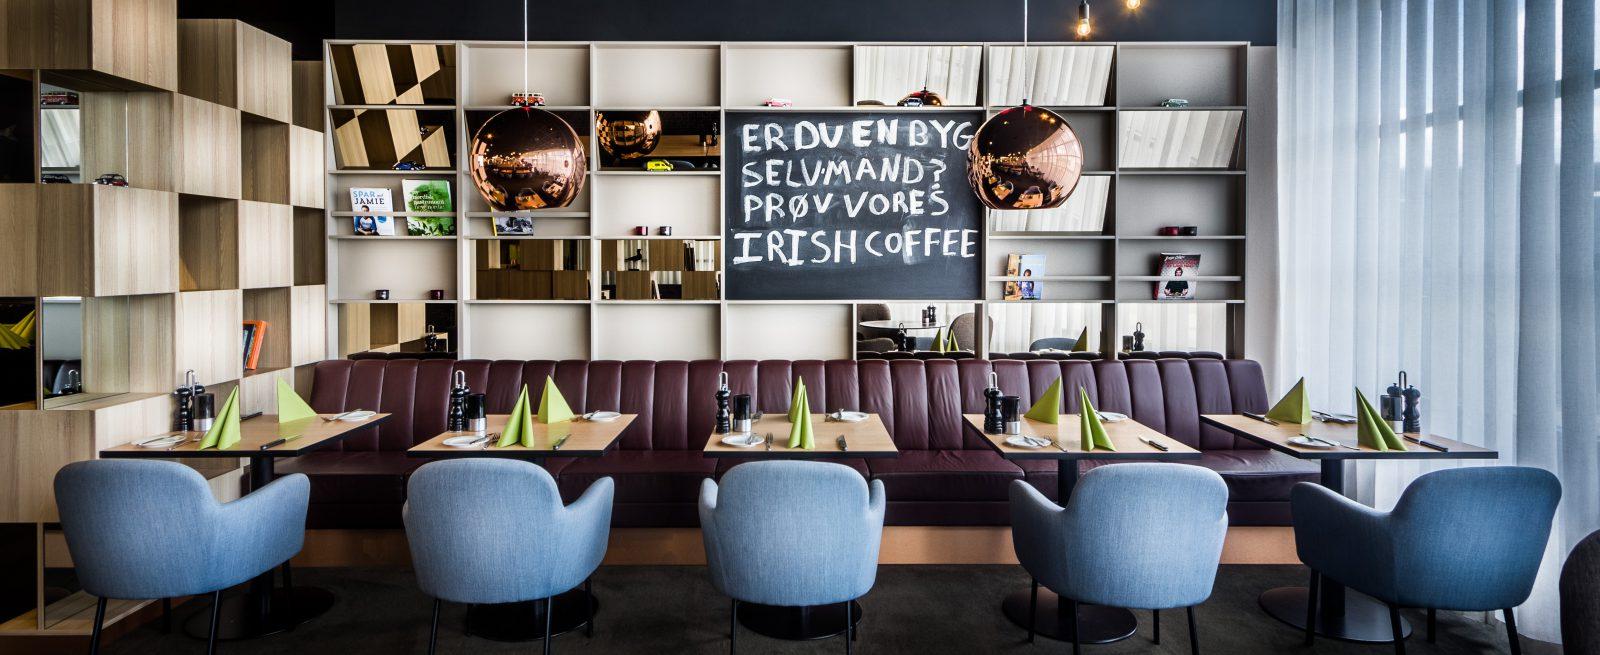 How A Restaurant S Interior Design Can Affect Your Brand Modern Restaurant Management The Business Of Eating Restaurant Management News